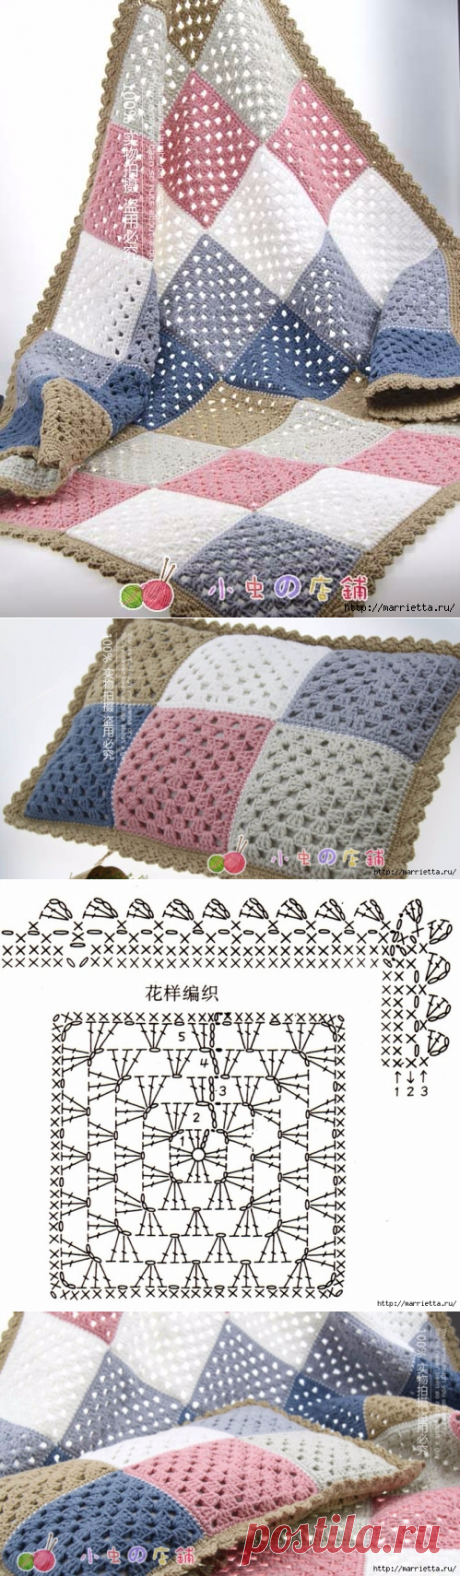 Детский плед и подушка крючком бабушкиными квадратами